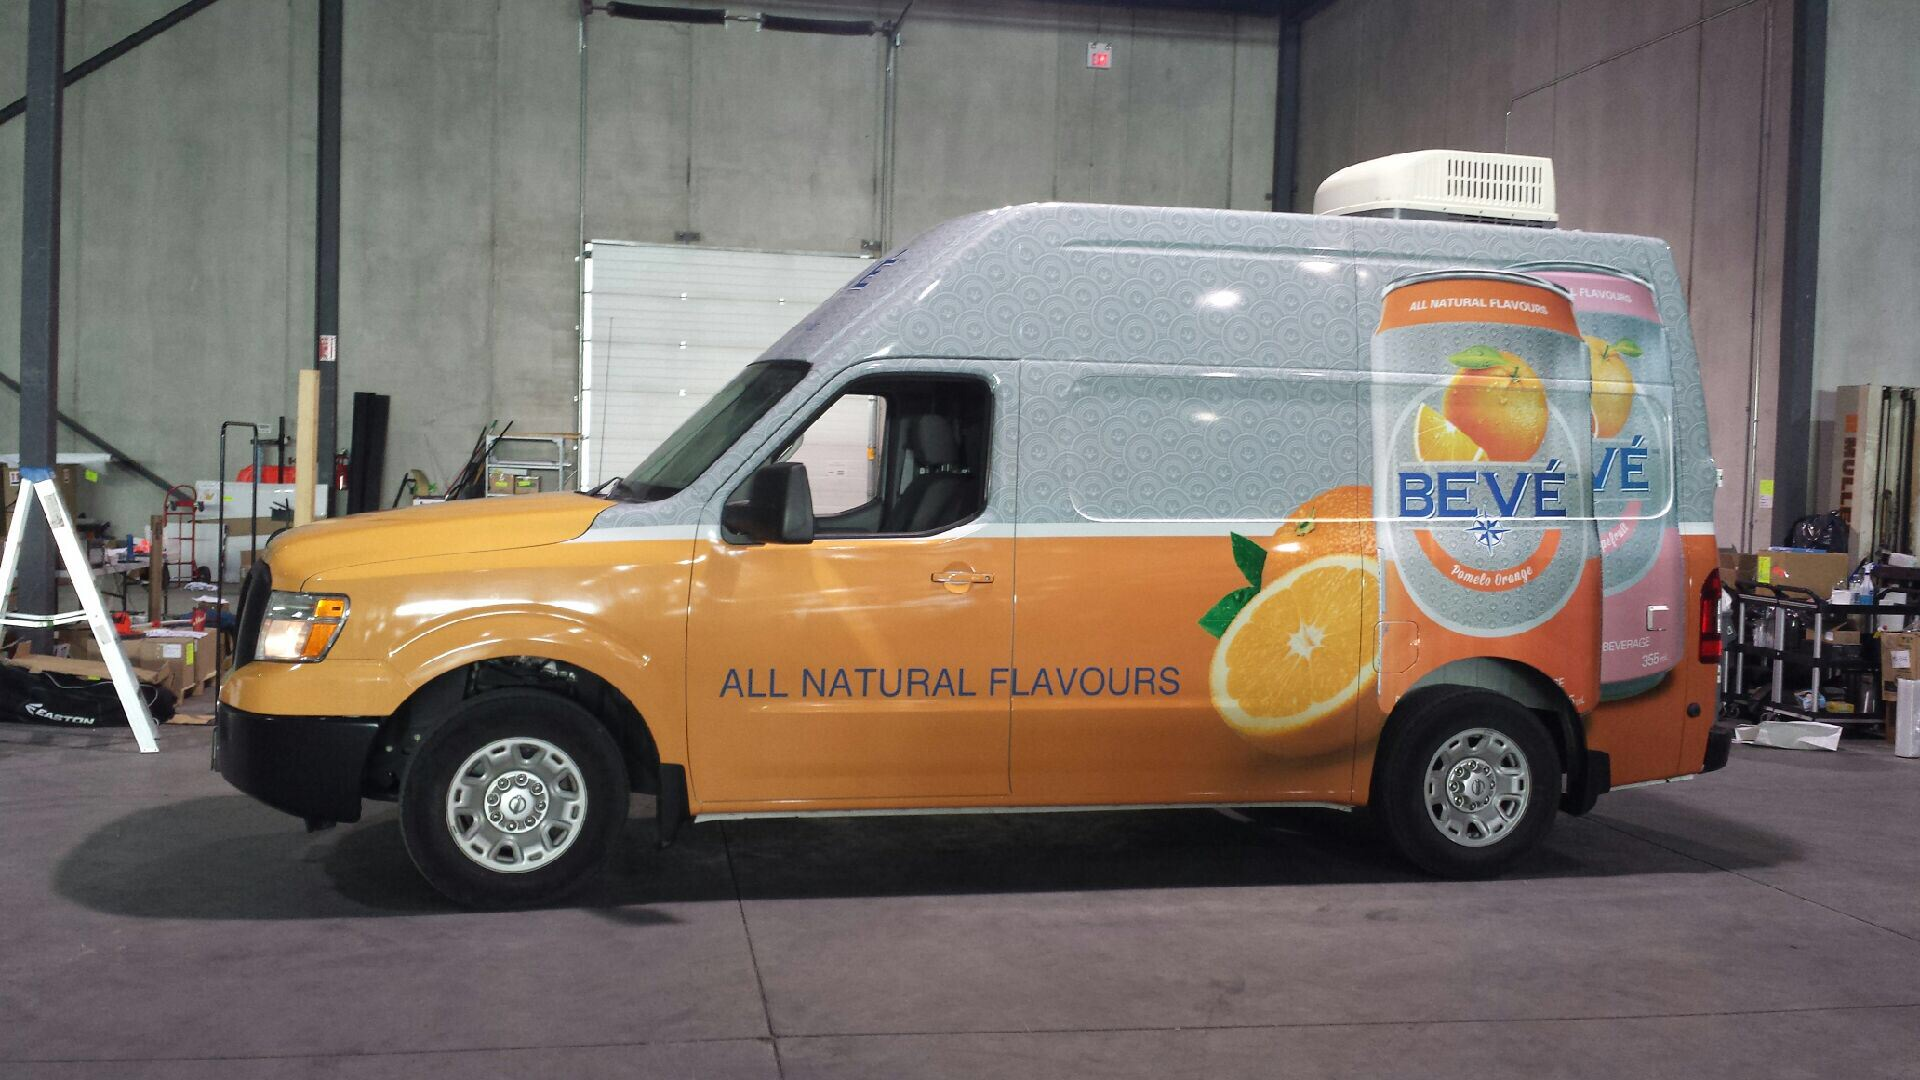 Vehicle wrap - Beve Mobile mixer